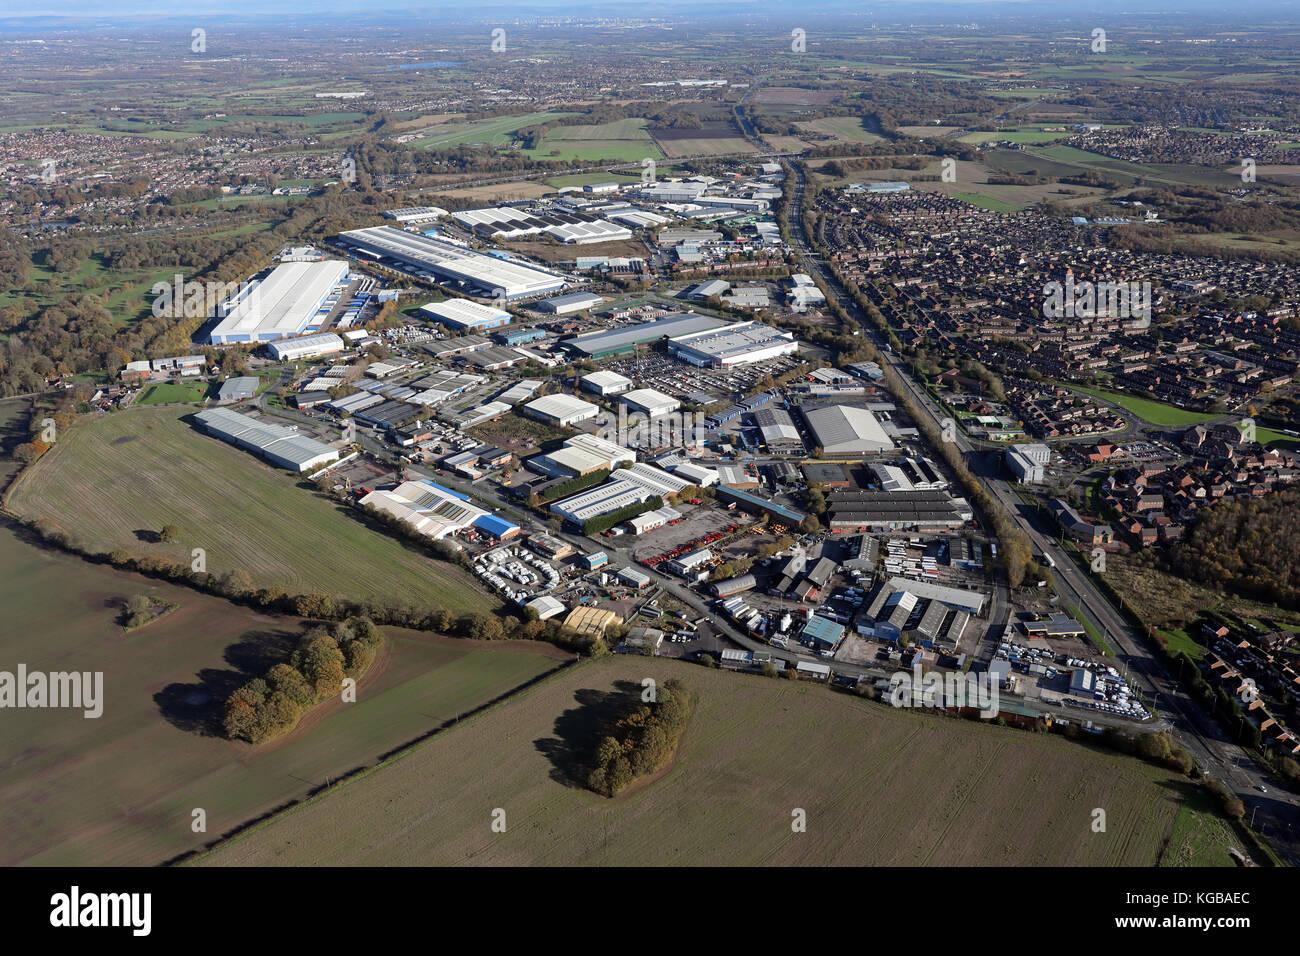 aerial view of Haydock Lane & Haydock Cross Industrial Estates, St Helens, UK - Stock Image